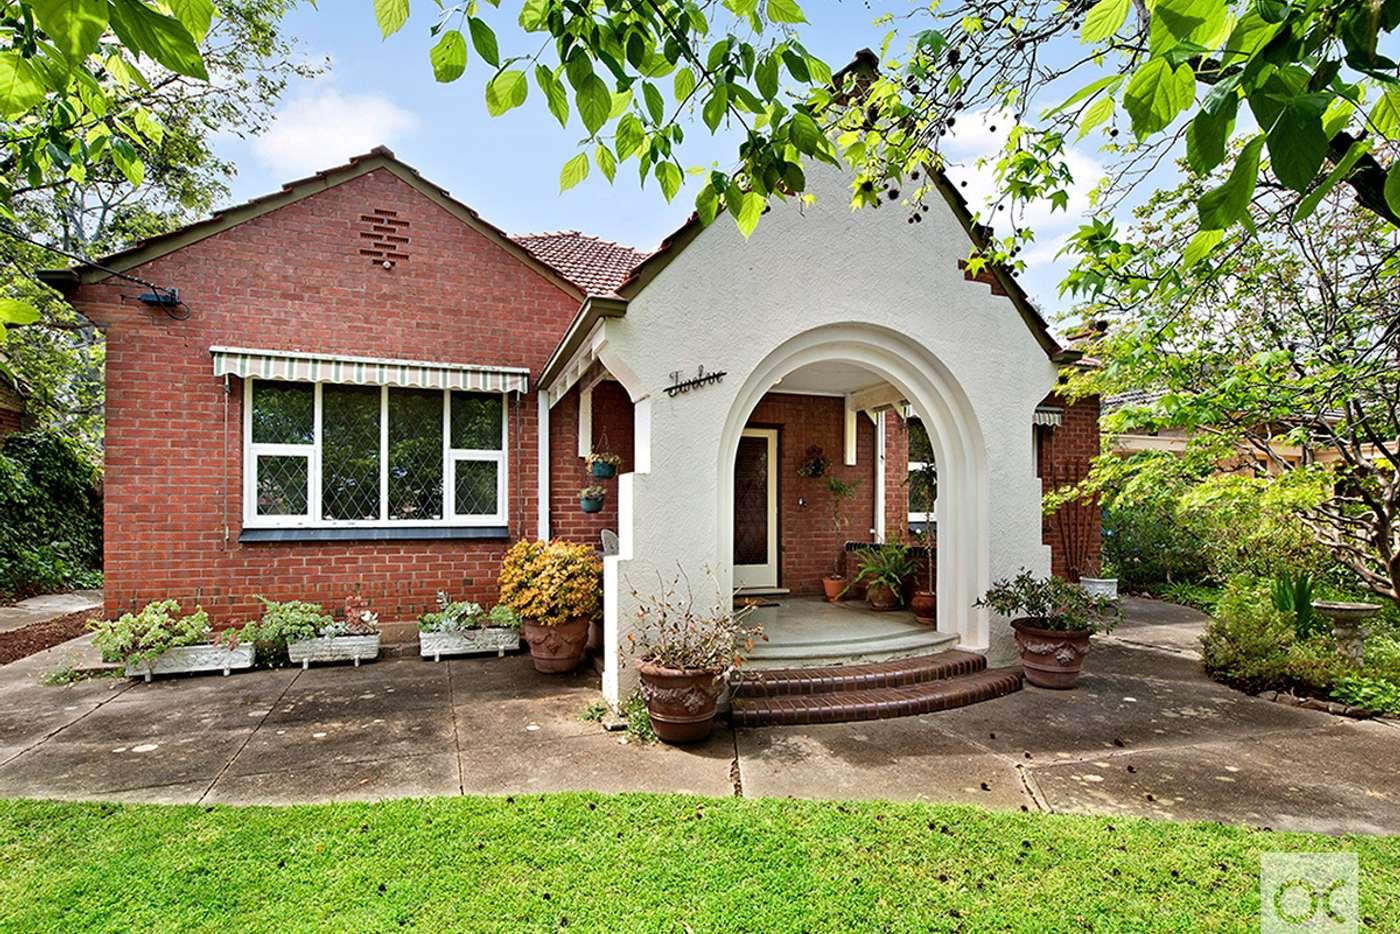 Main view of Homely house listing, 12 Kennaway Street, Tusmore SA 5065